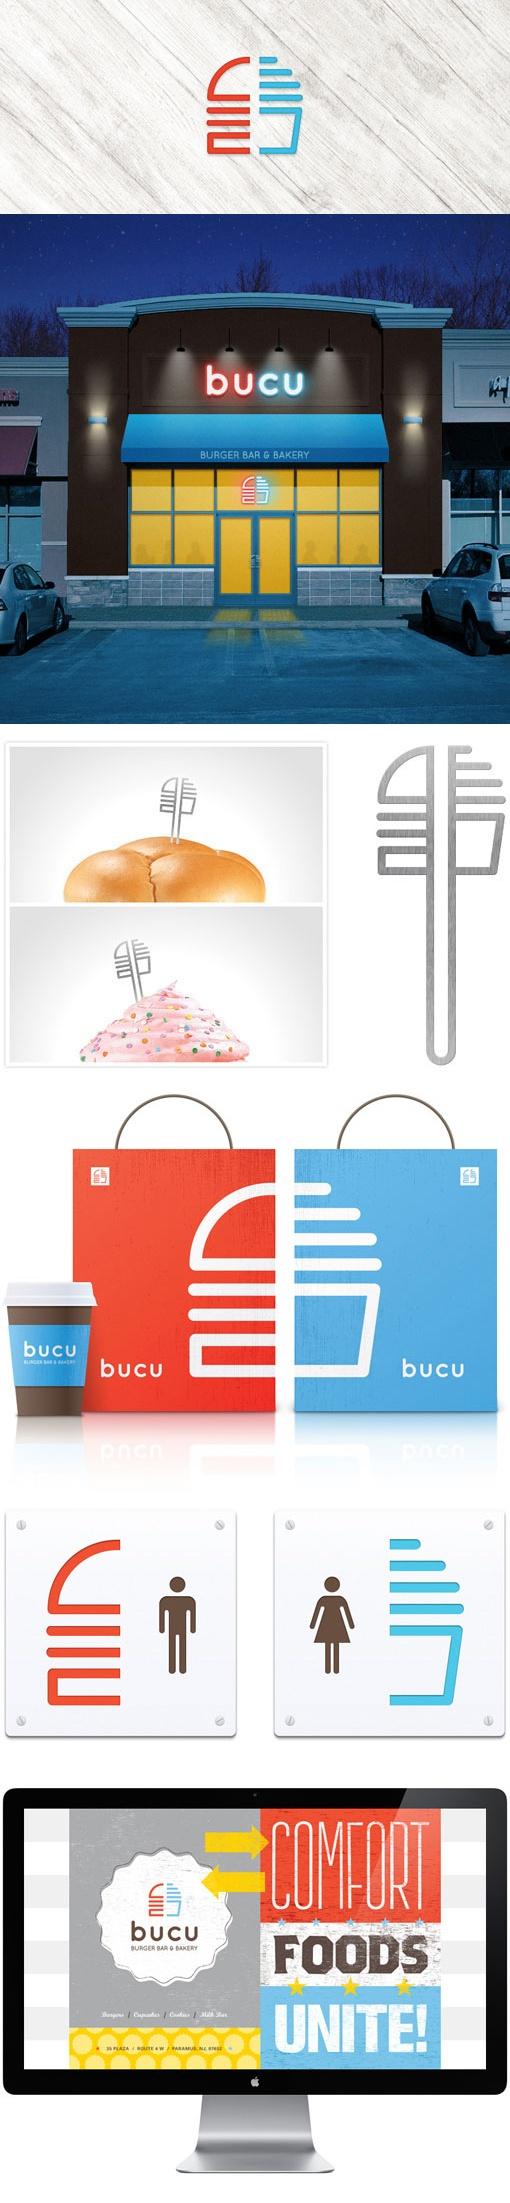 BUCU burger and cupcake restaurant. branding. identity design. graphic design. design by Stebbings Partners